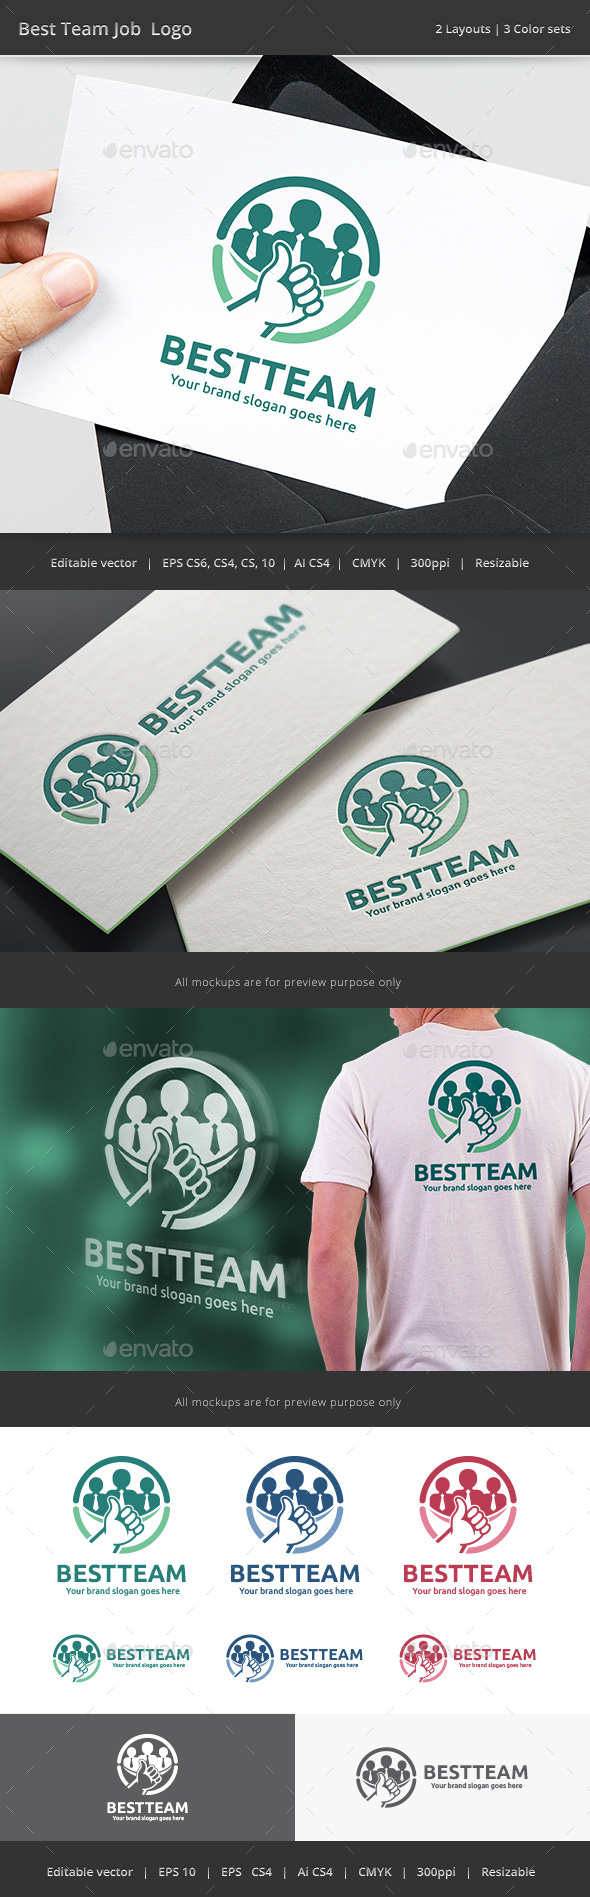 Best Team Job Logo - Vector Abstract